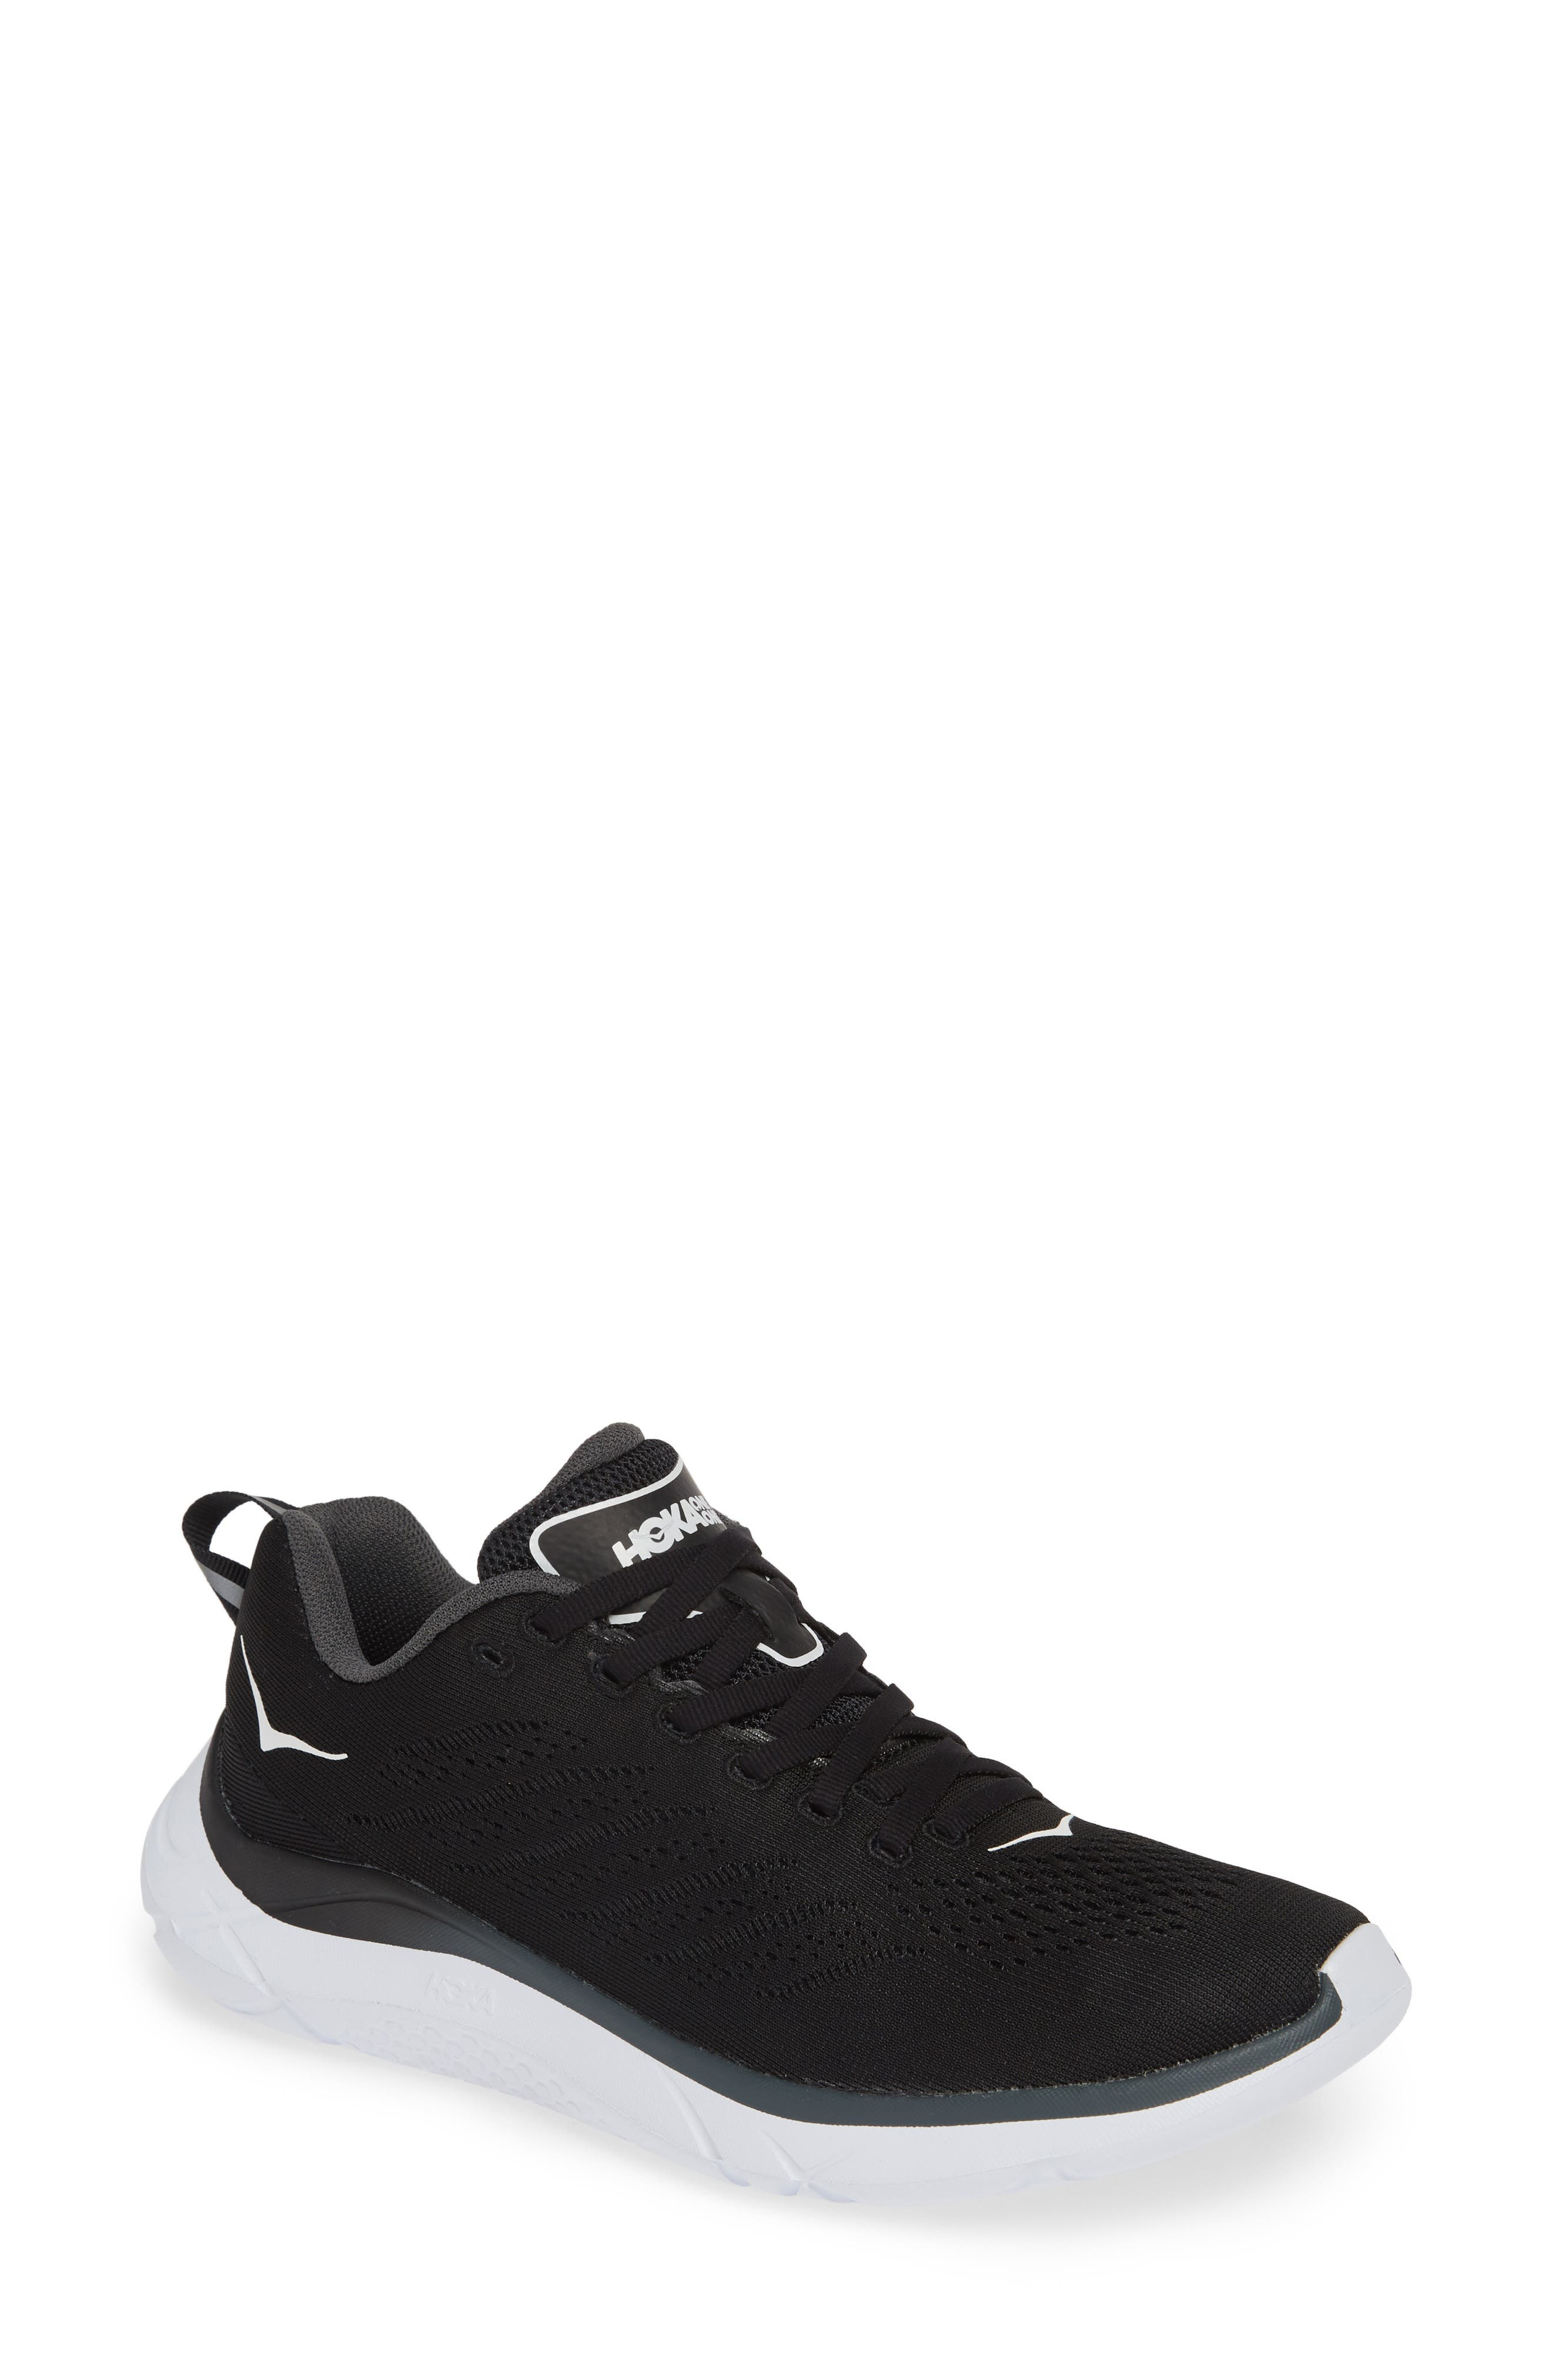 Hoka One One Hupana Em Sneaker- Black